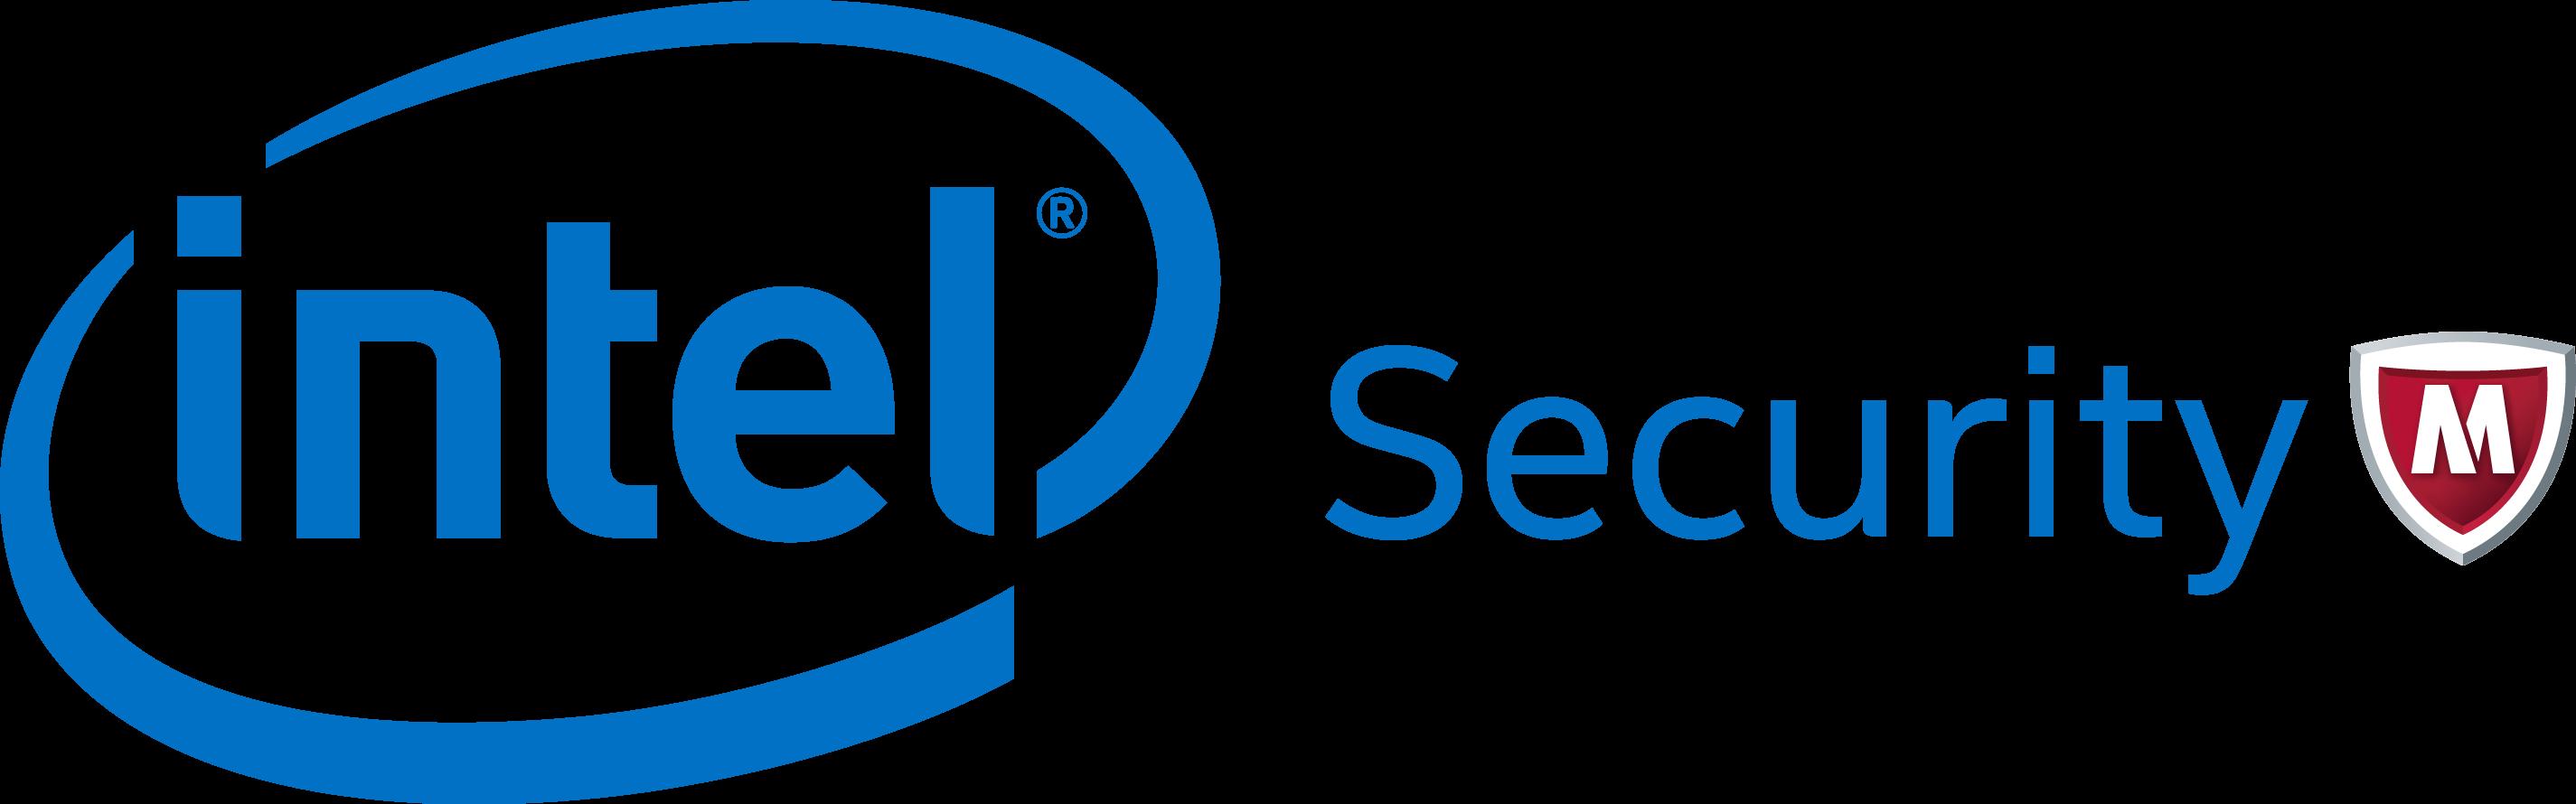 Intel_McAfee_Security